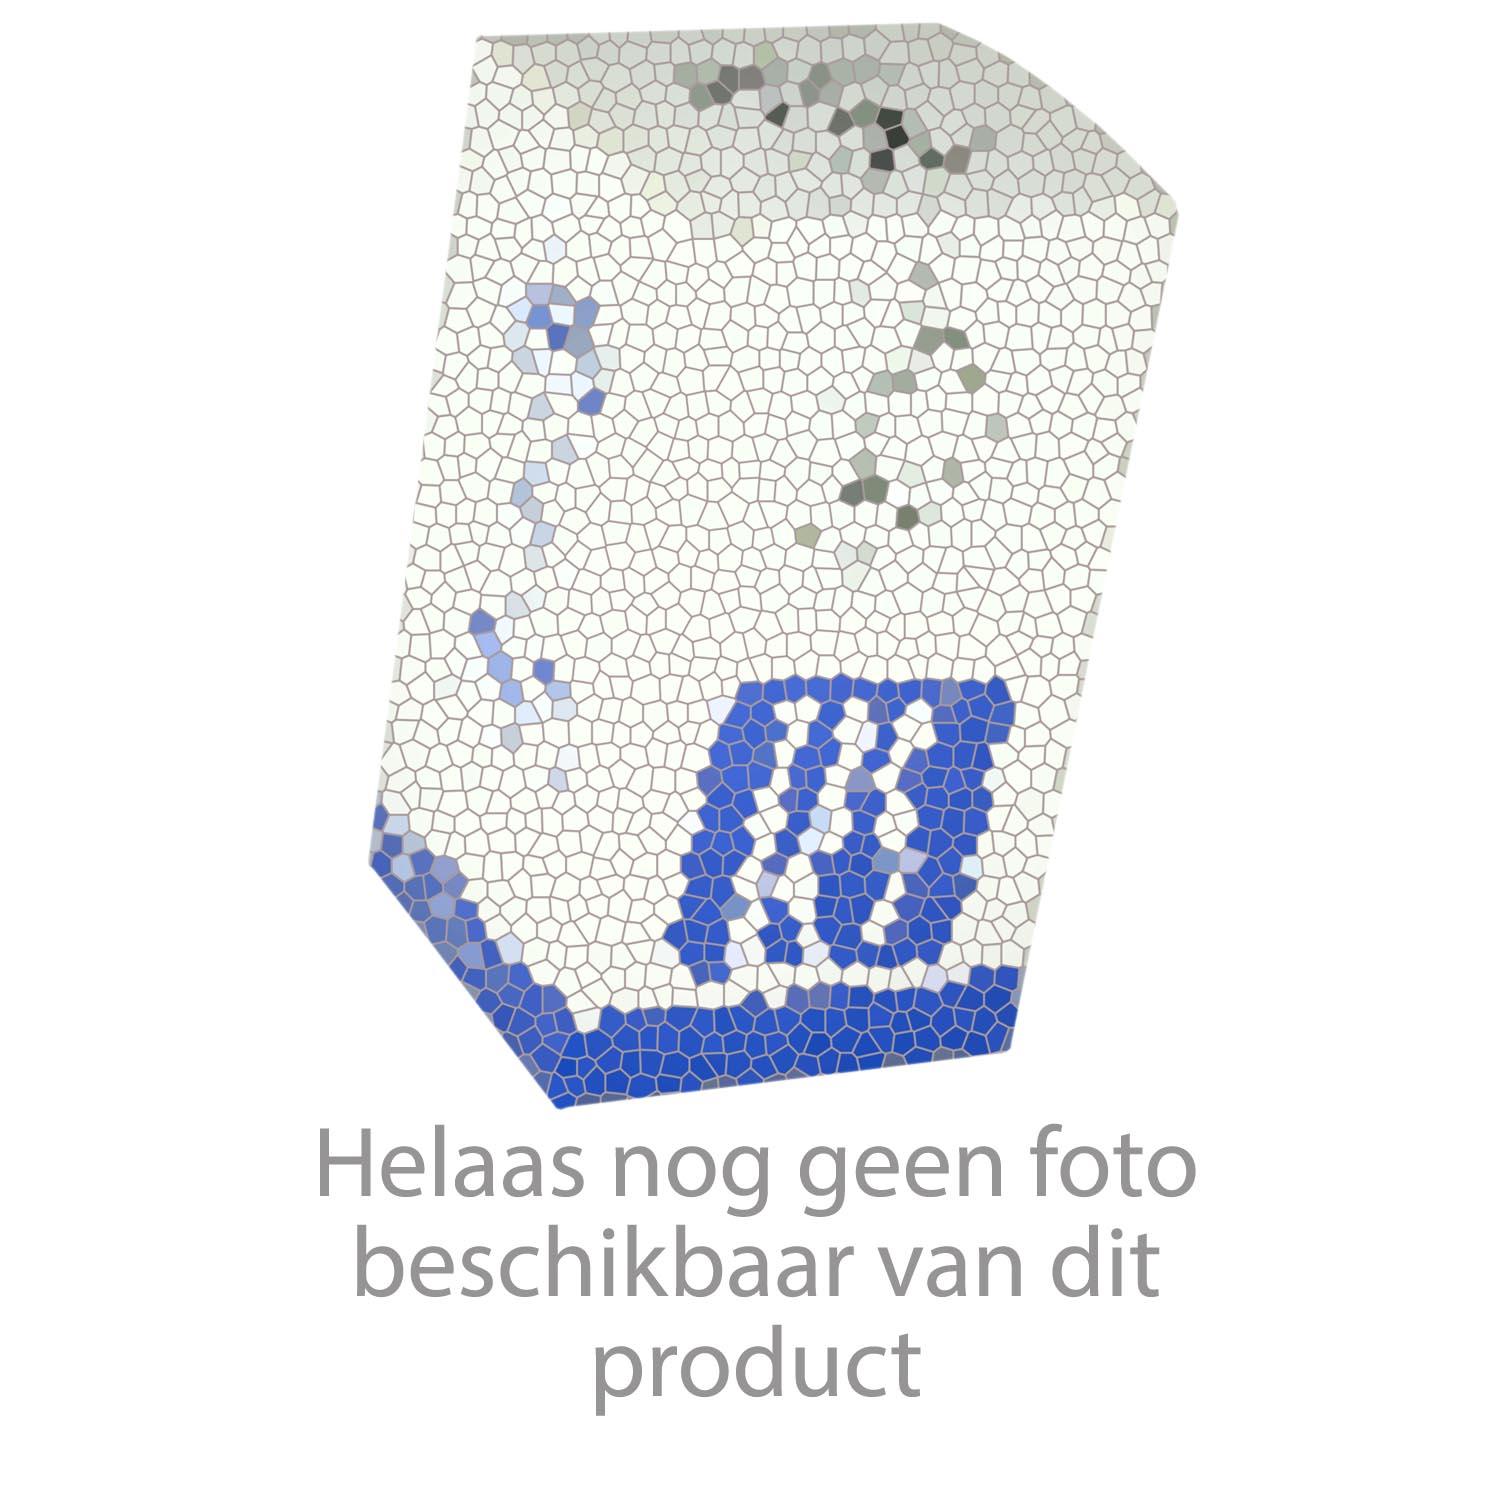 Aqua bovendeel voor urinoirspoeler 1/2 met witte knop